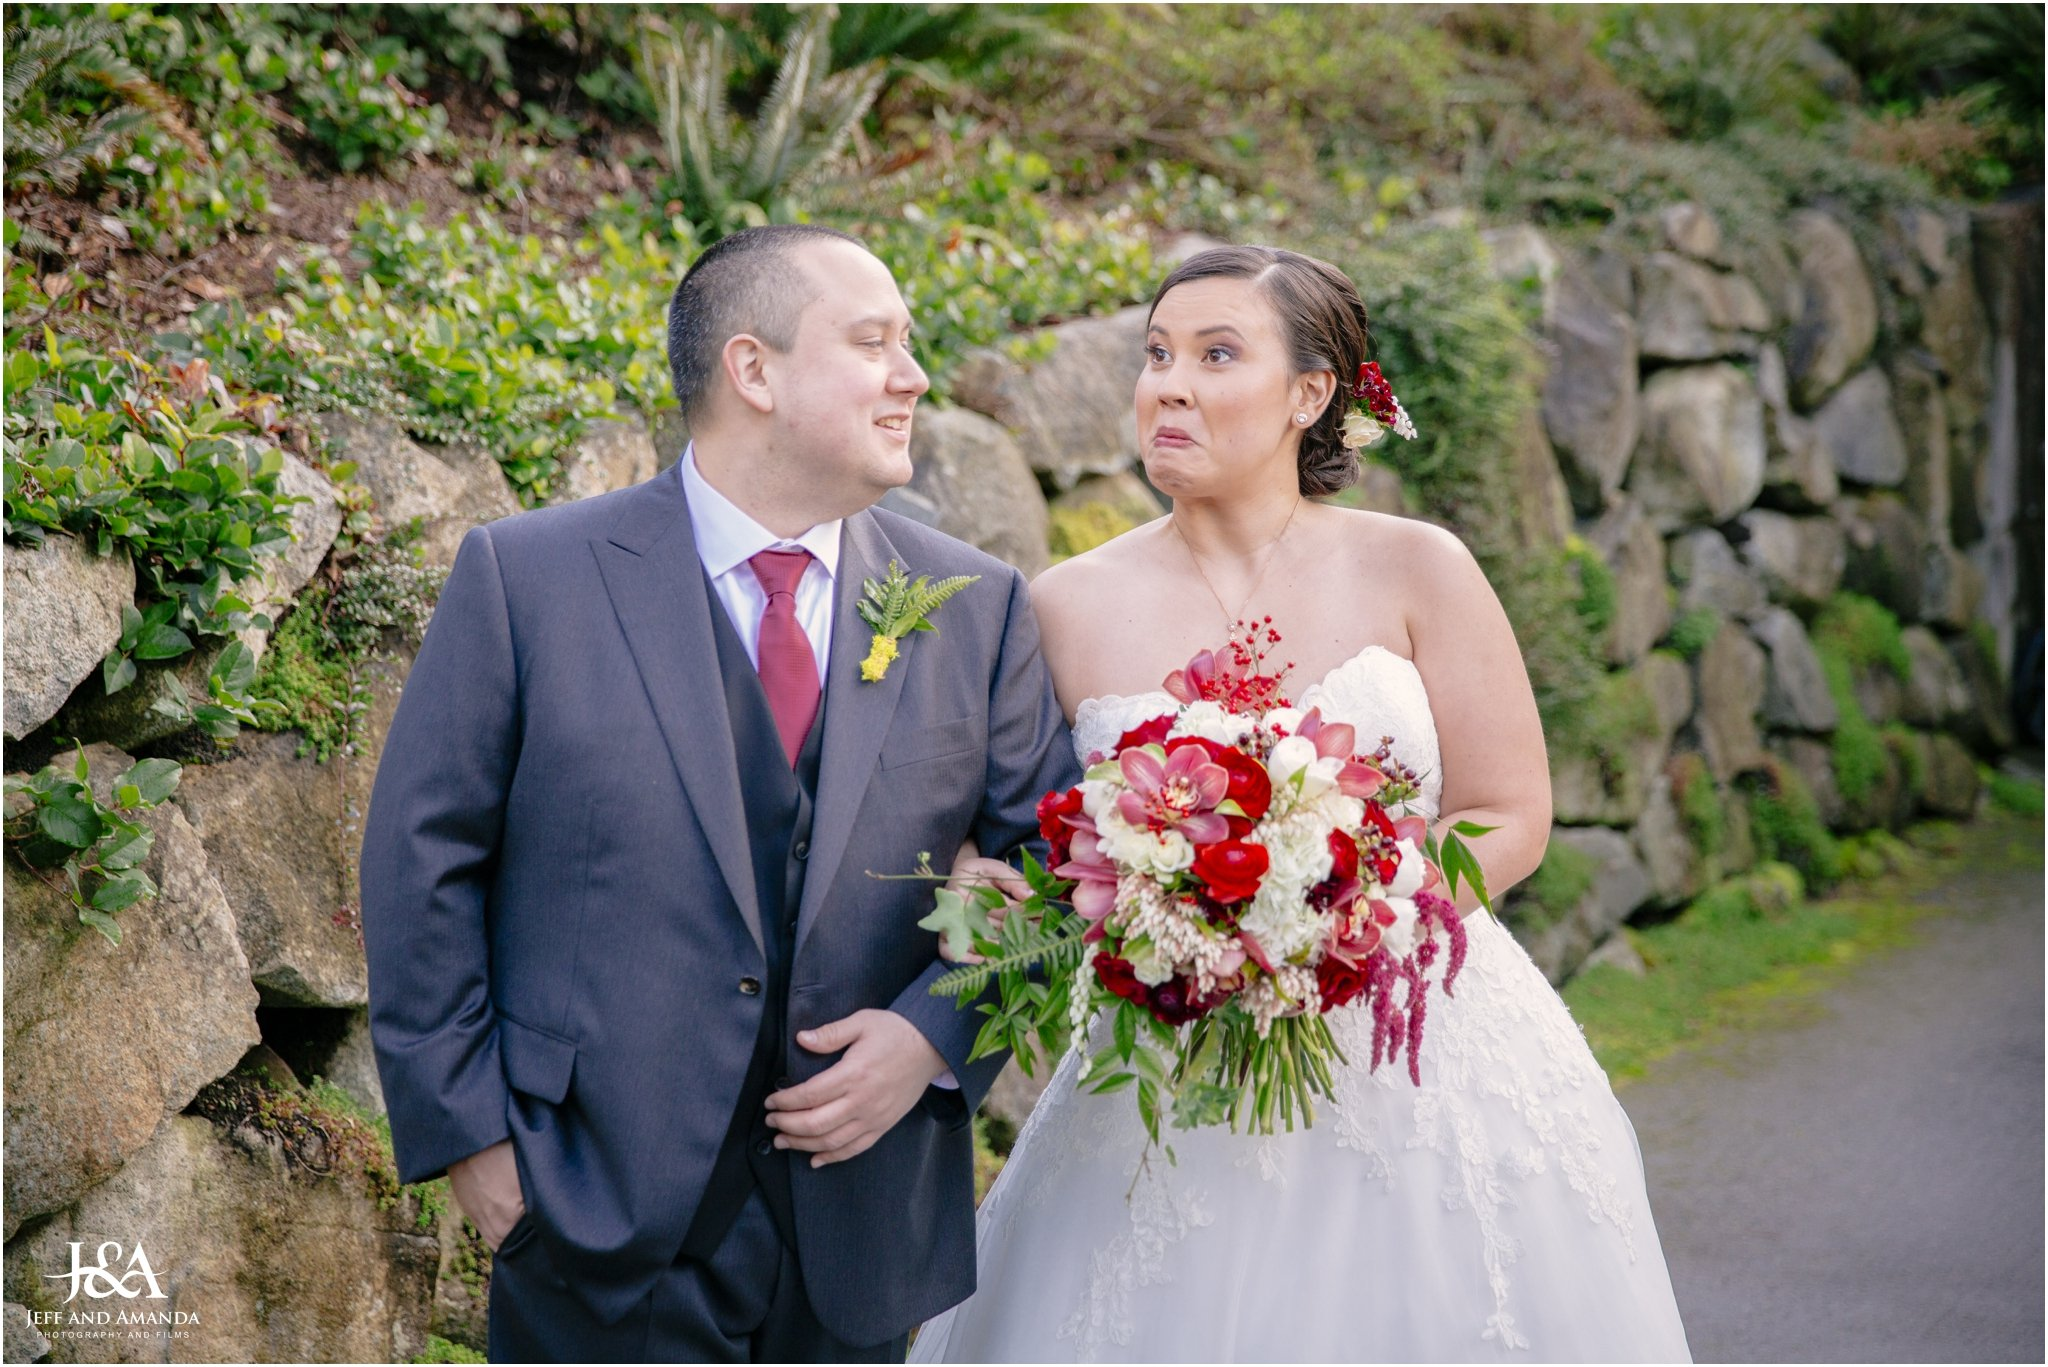 Dave and Kari s Wedding-Facebook Ready-0271.jpg